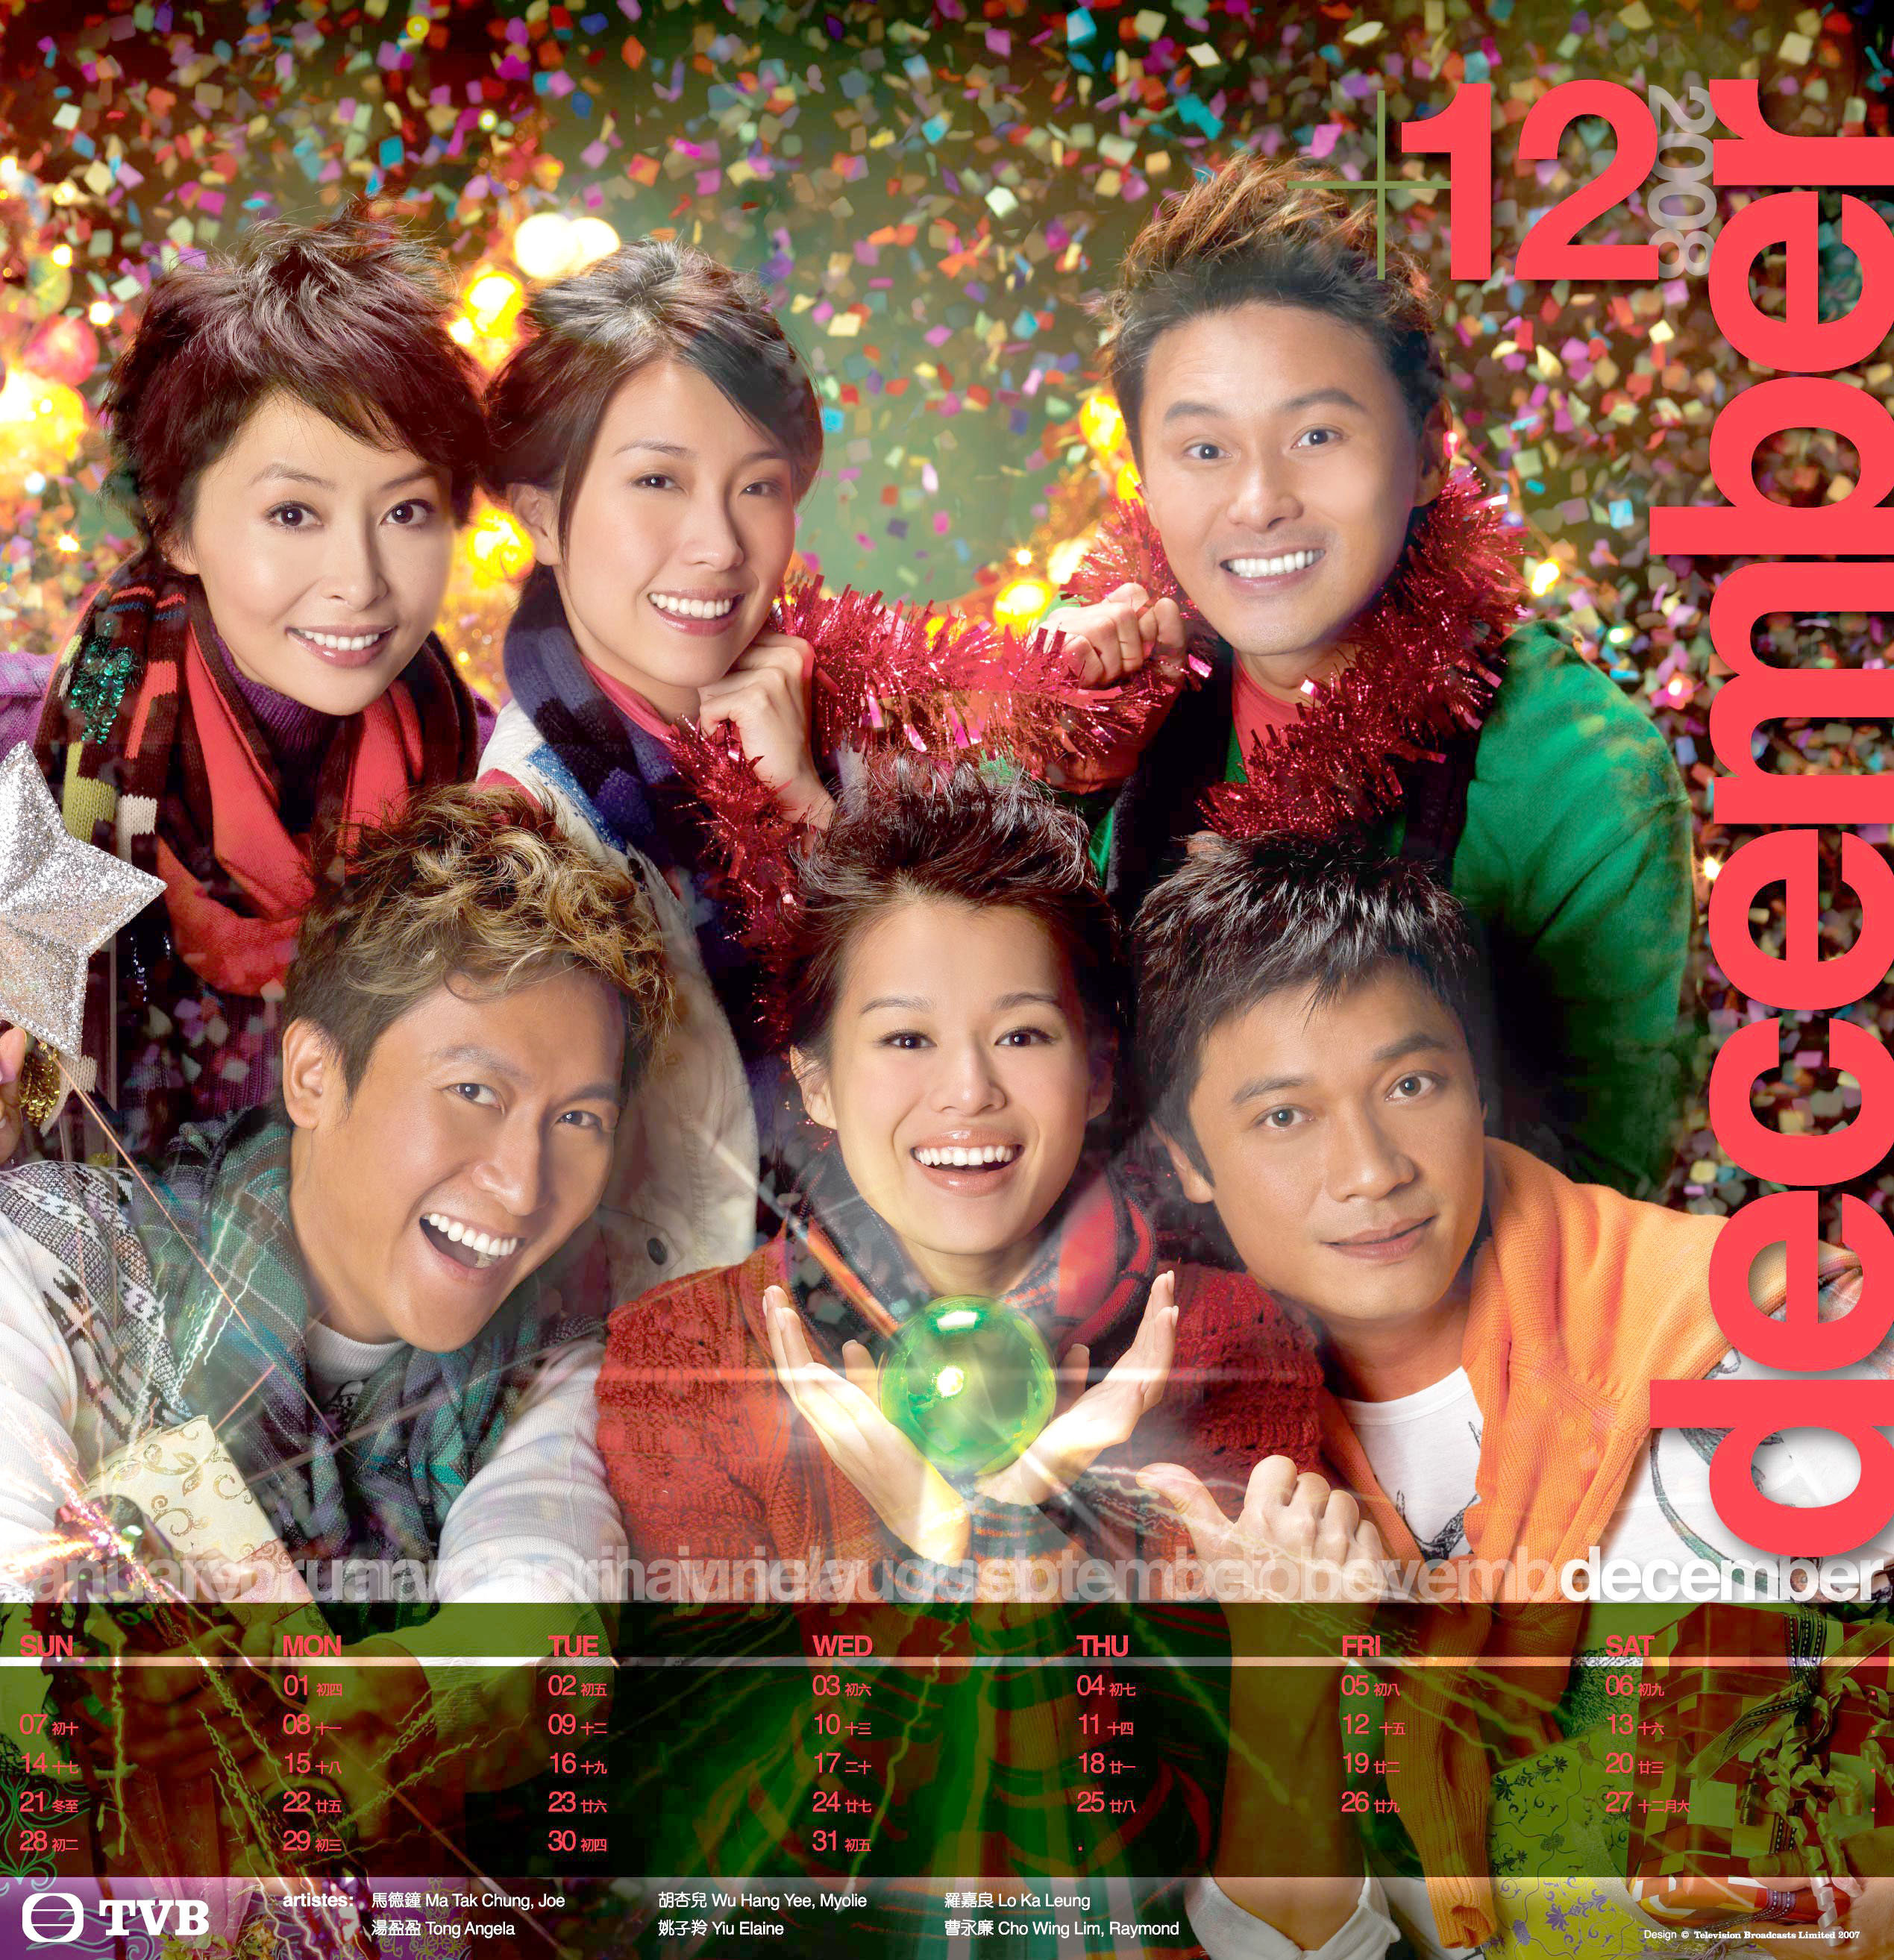 Hong Kong TVB calendar December 2008